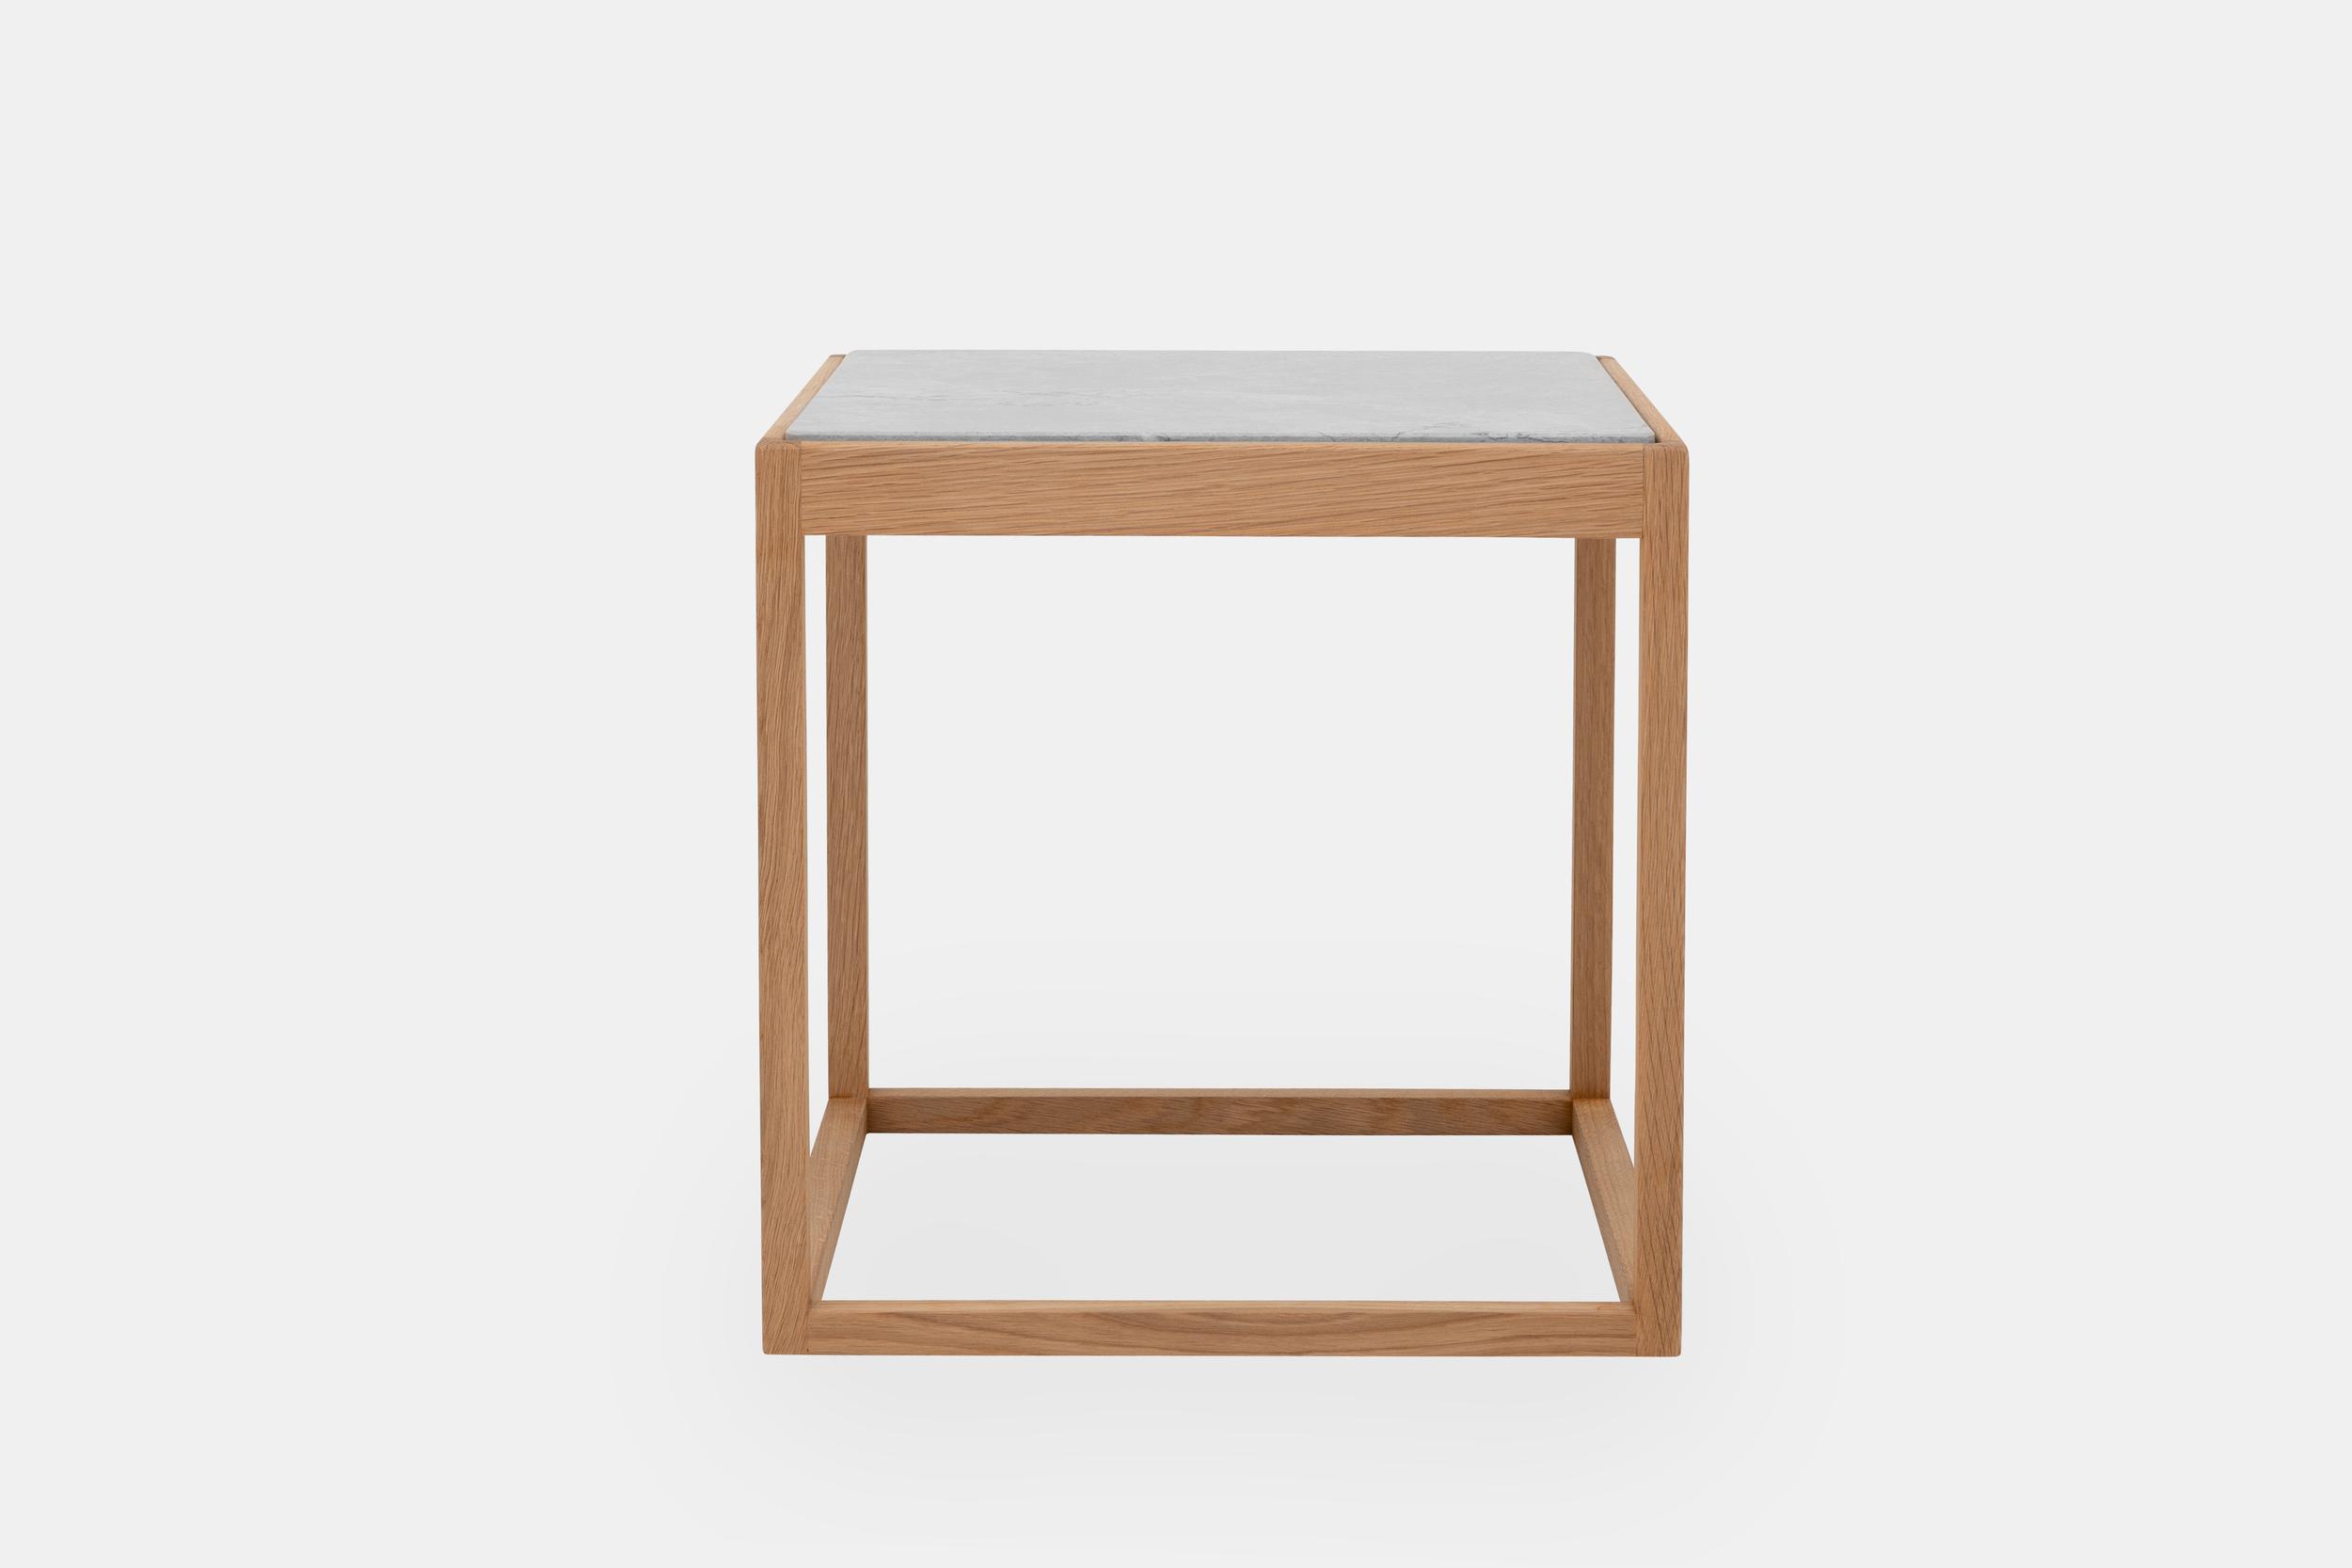 cubetable-oak-light-grey-marble.png